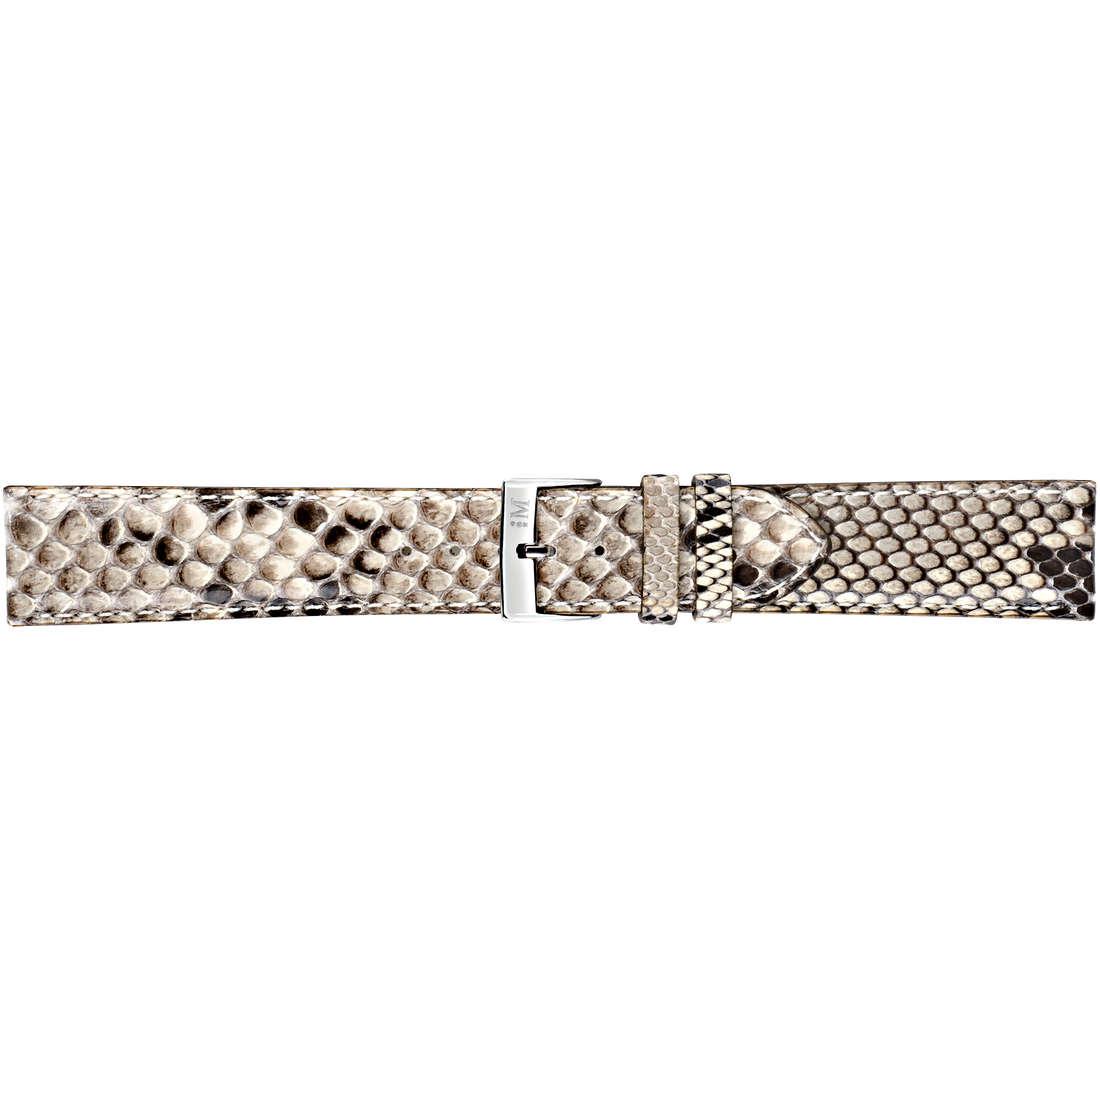 watch watch bands watch straps man Morellato Pelli Preziose A01X1458474024CR16